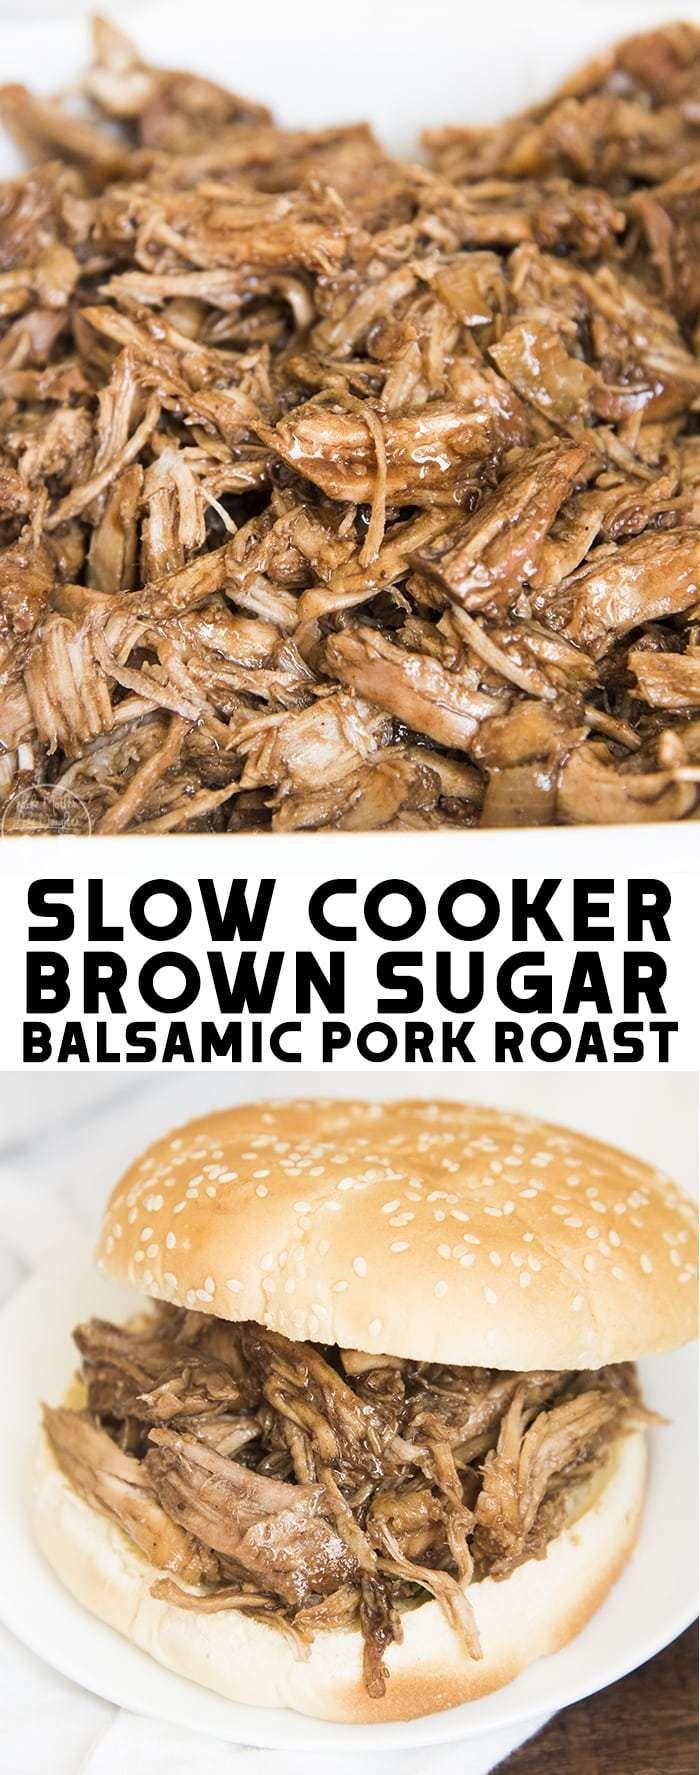 This Slow Cooker Brown Sugar Balsamic Pork Roast is a flavorful, tender pork tha…